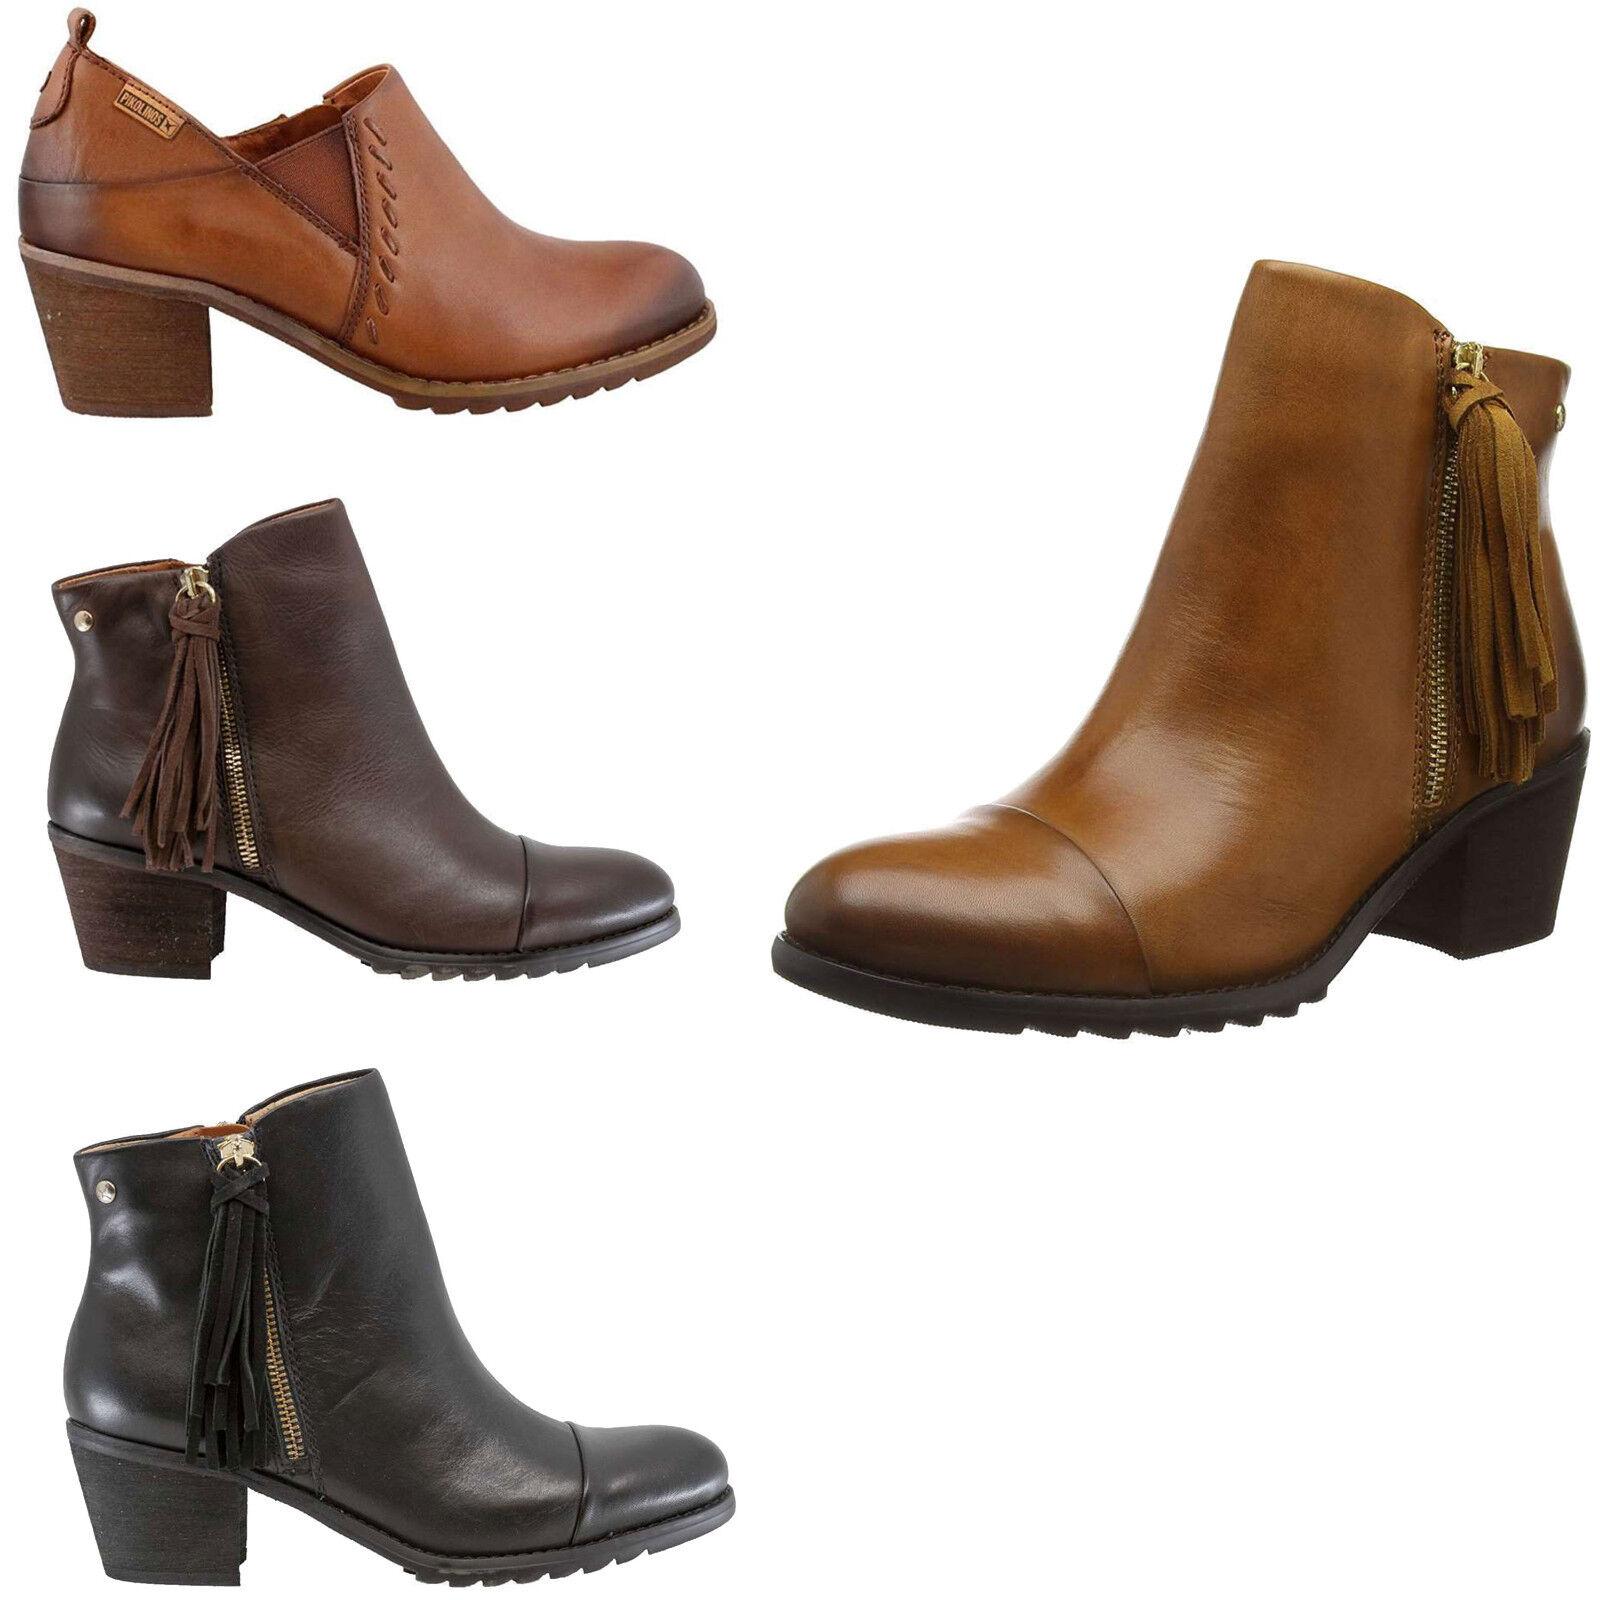 Pikolinos Andorra Ankle Stiefel Leather Slip On Zip 2  Stacked Heel damen Stiefelies